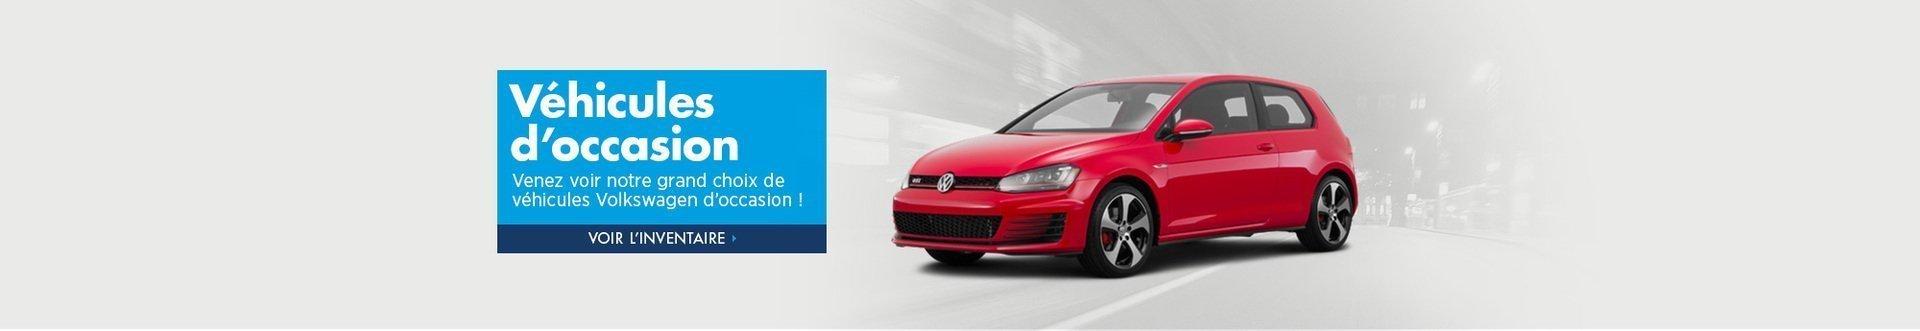 Vaudreuil Volkswagen | Concessionnaire Volkswagen à Vaudreuil (Rive